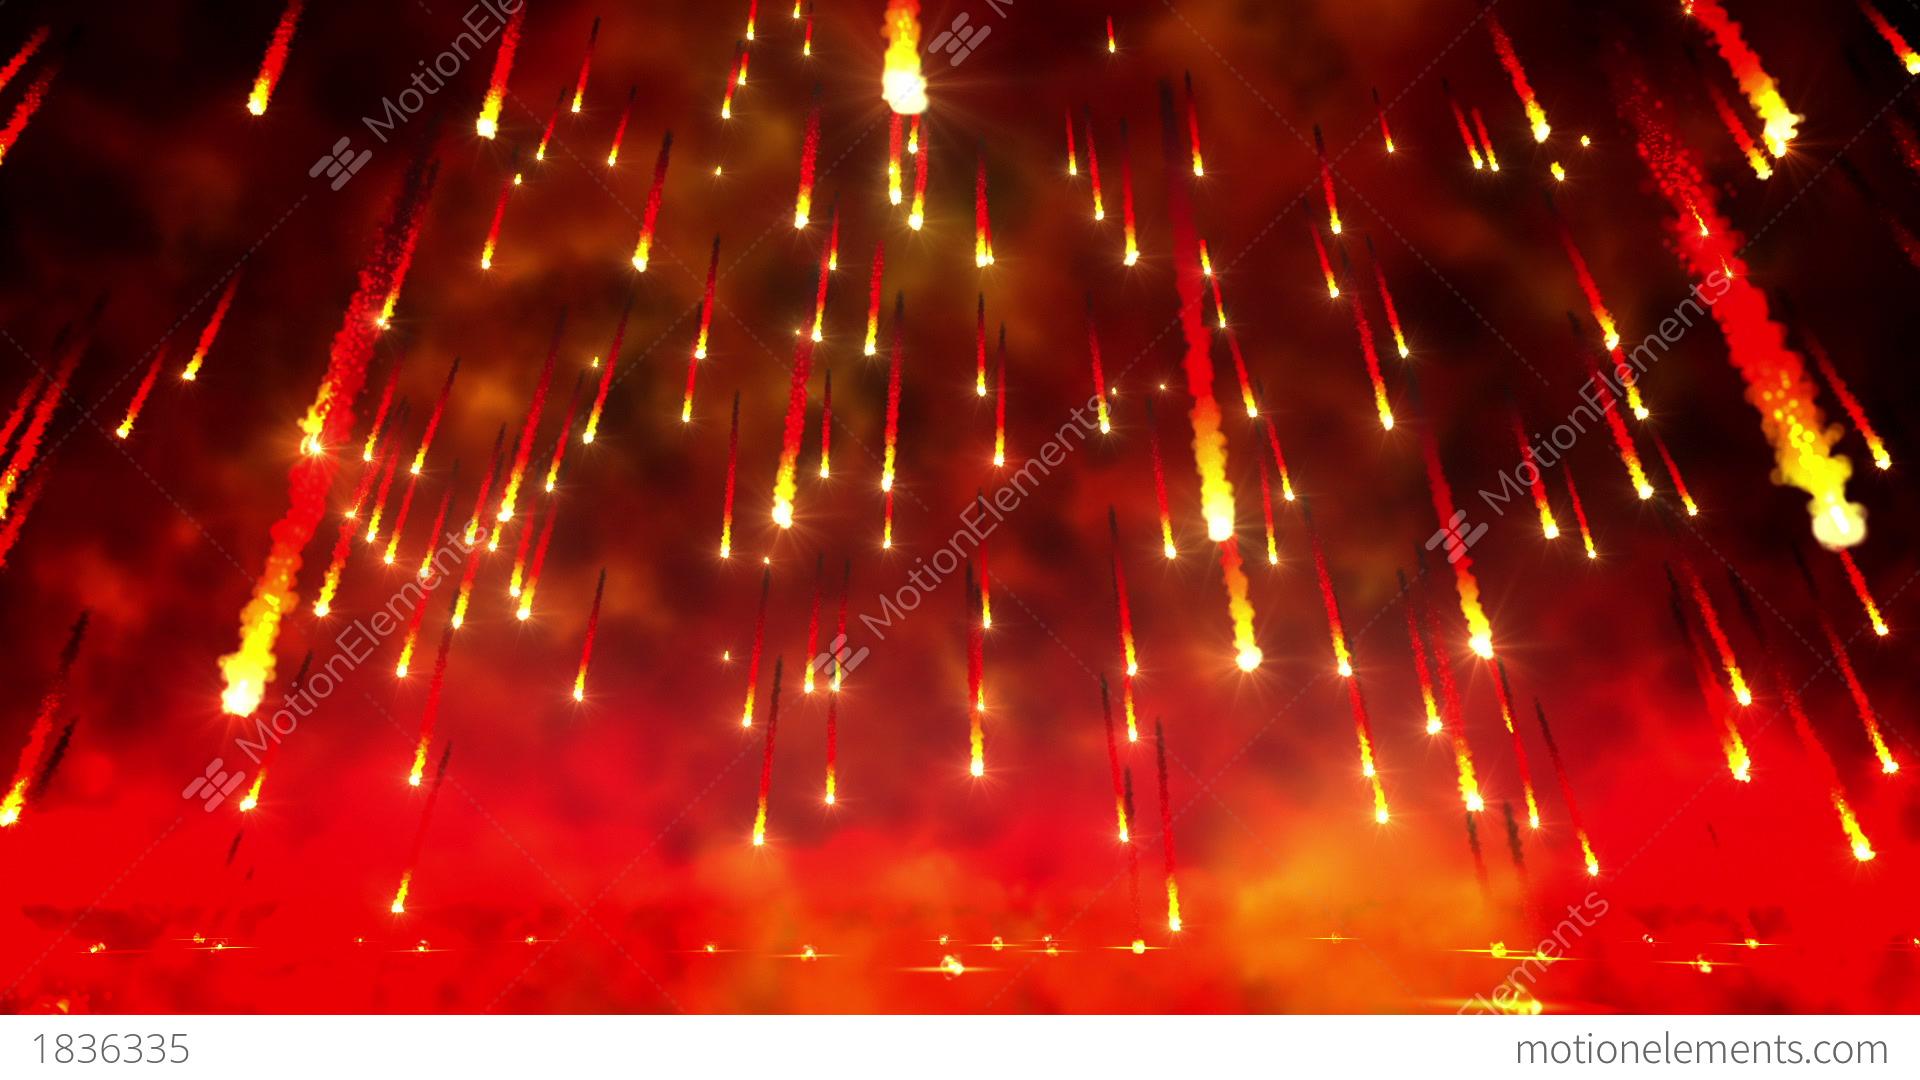 Danger 3d Wallpaper Fire Rain Loop Stock Animation 1836335